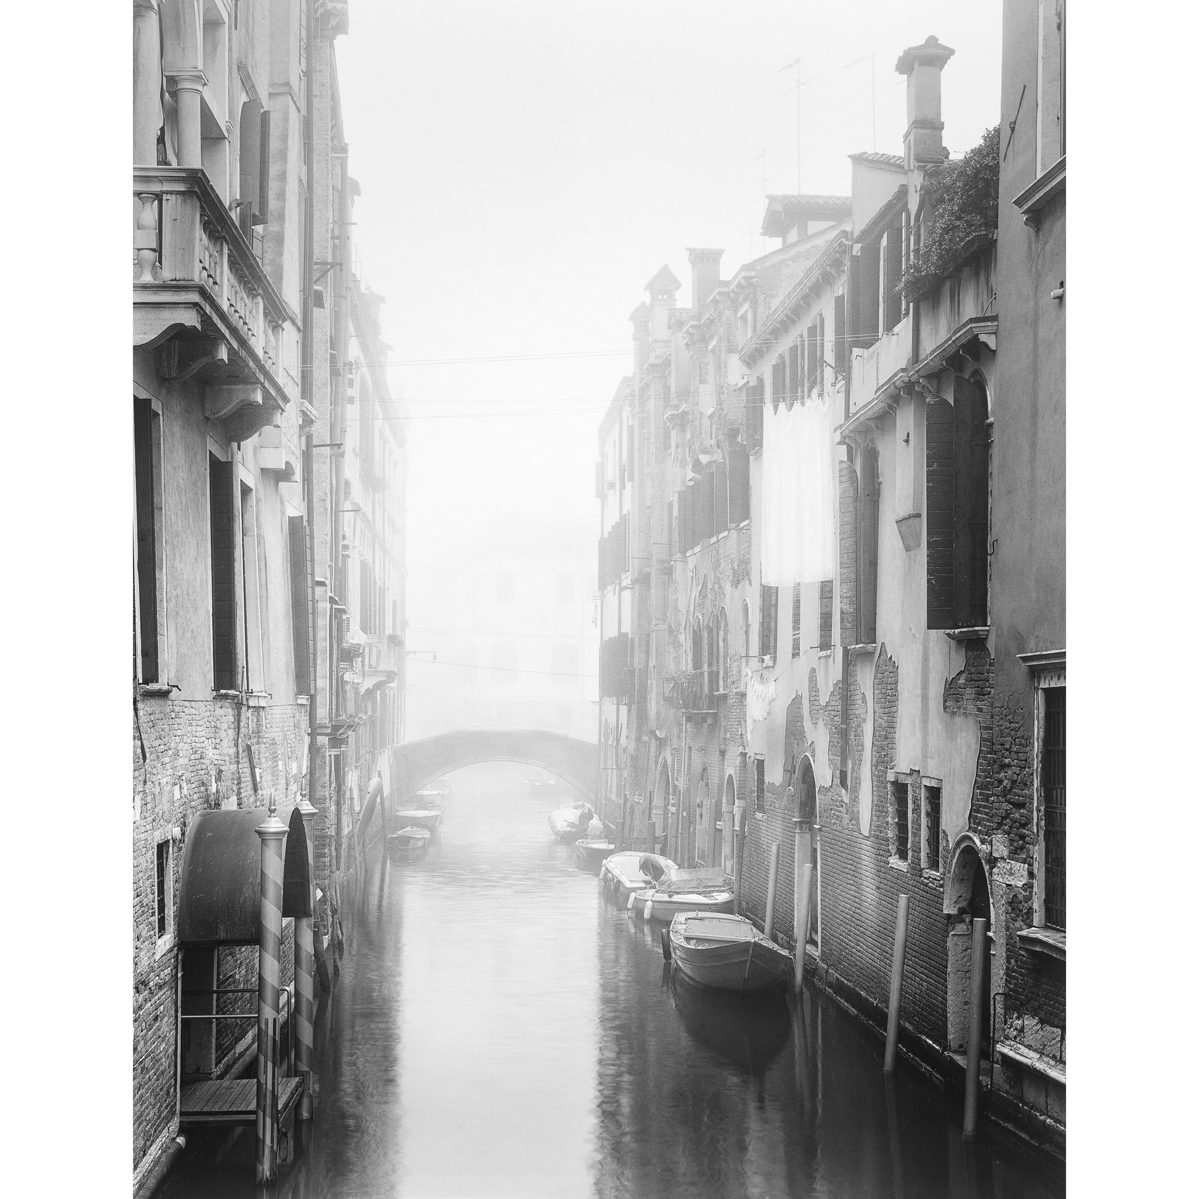 2015 Arca Swiss 4x5 Venice Italy MGFBWT 1K